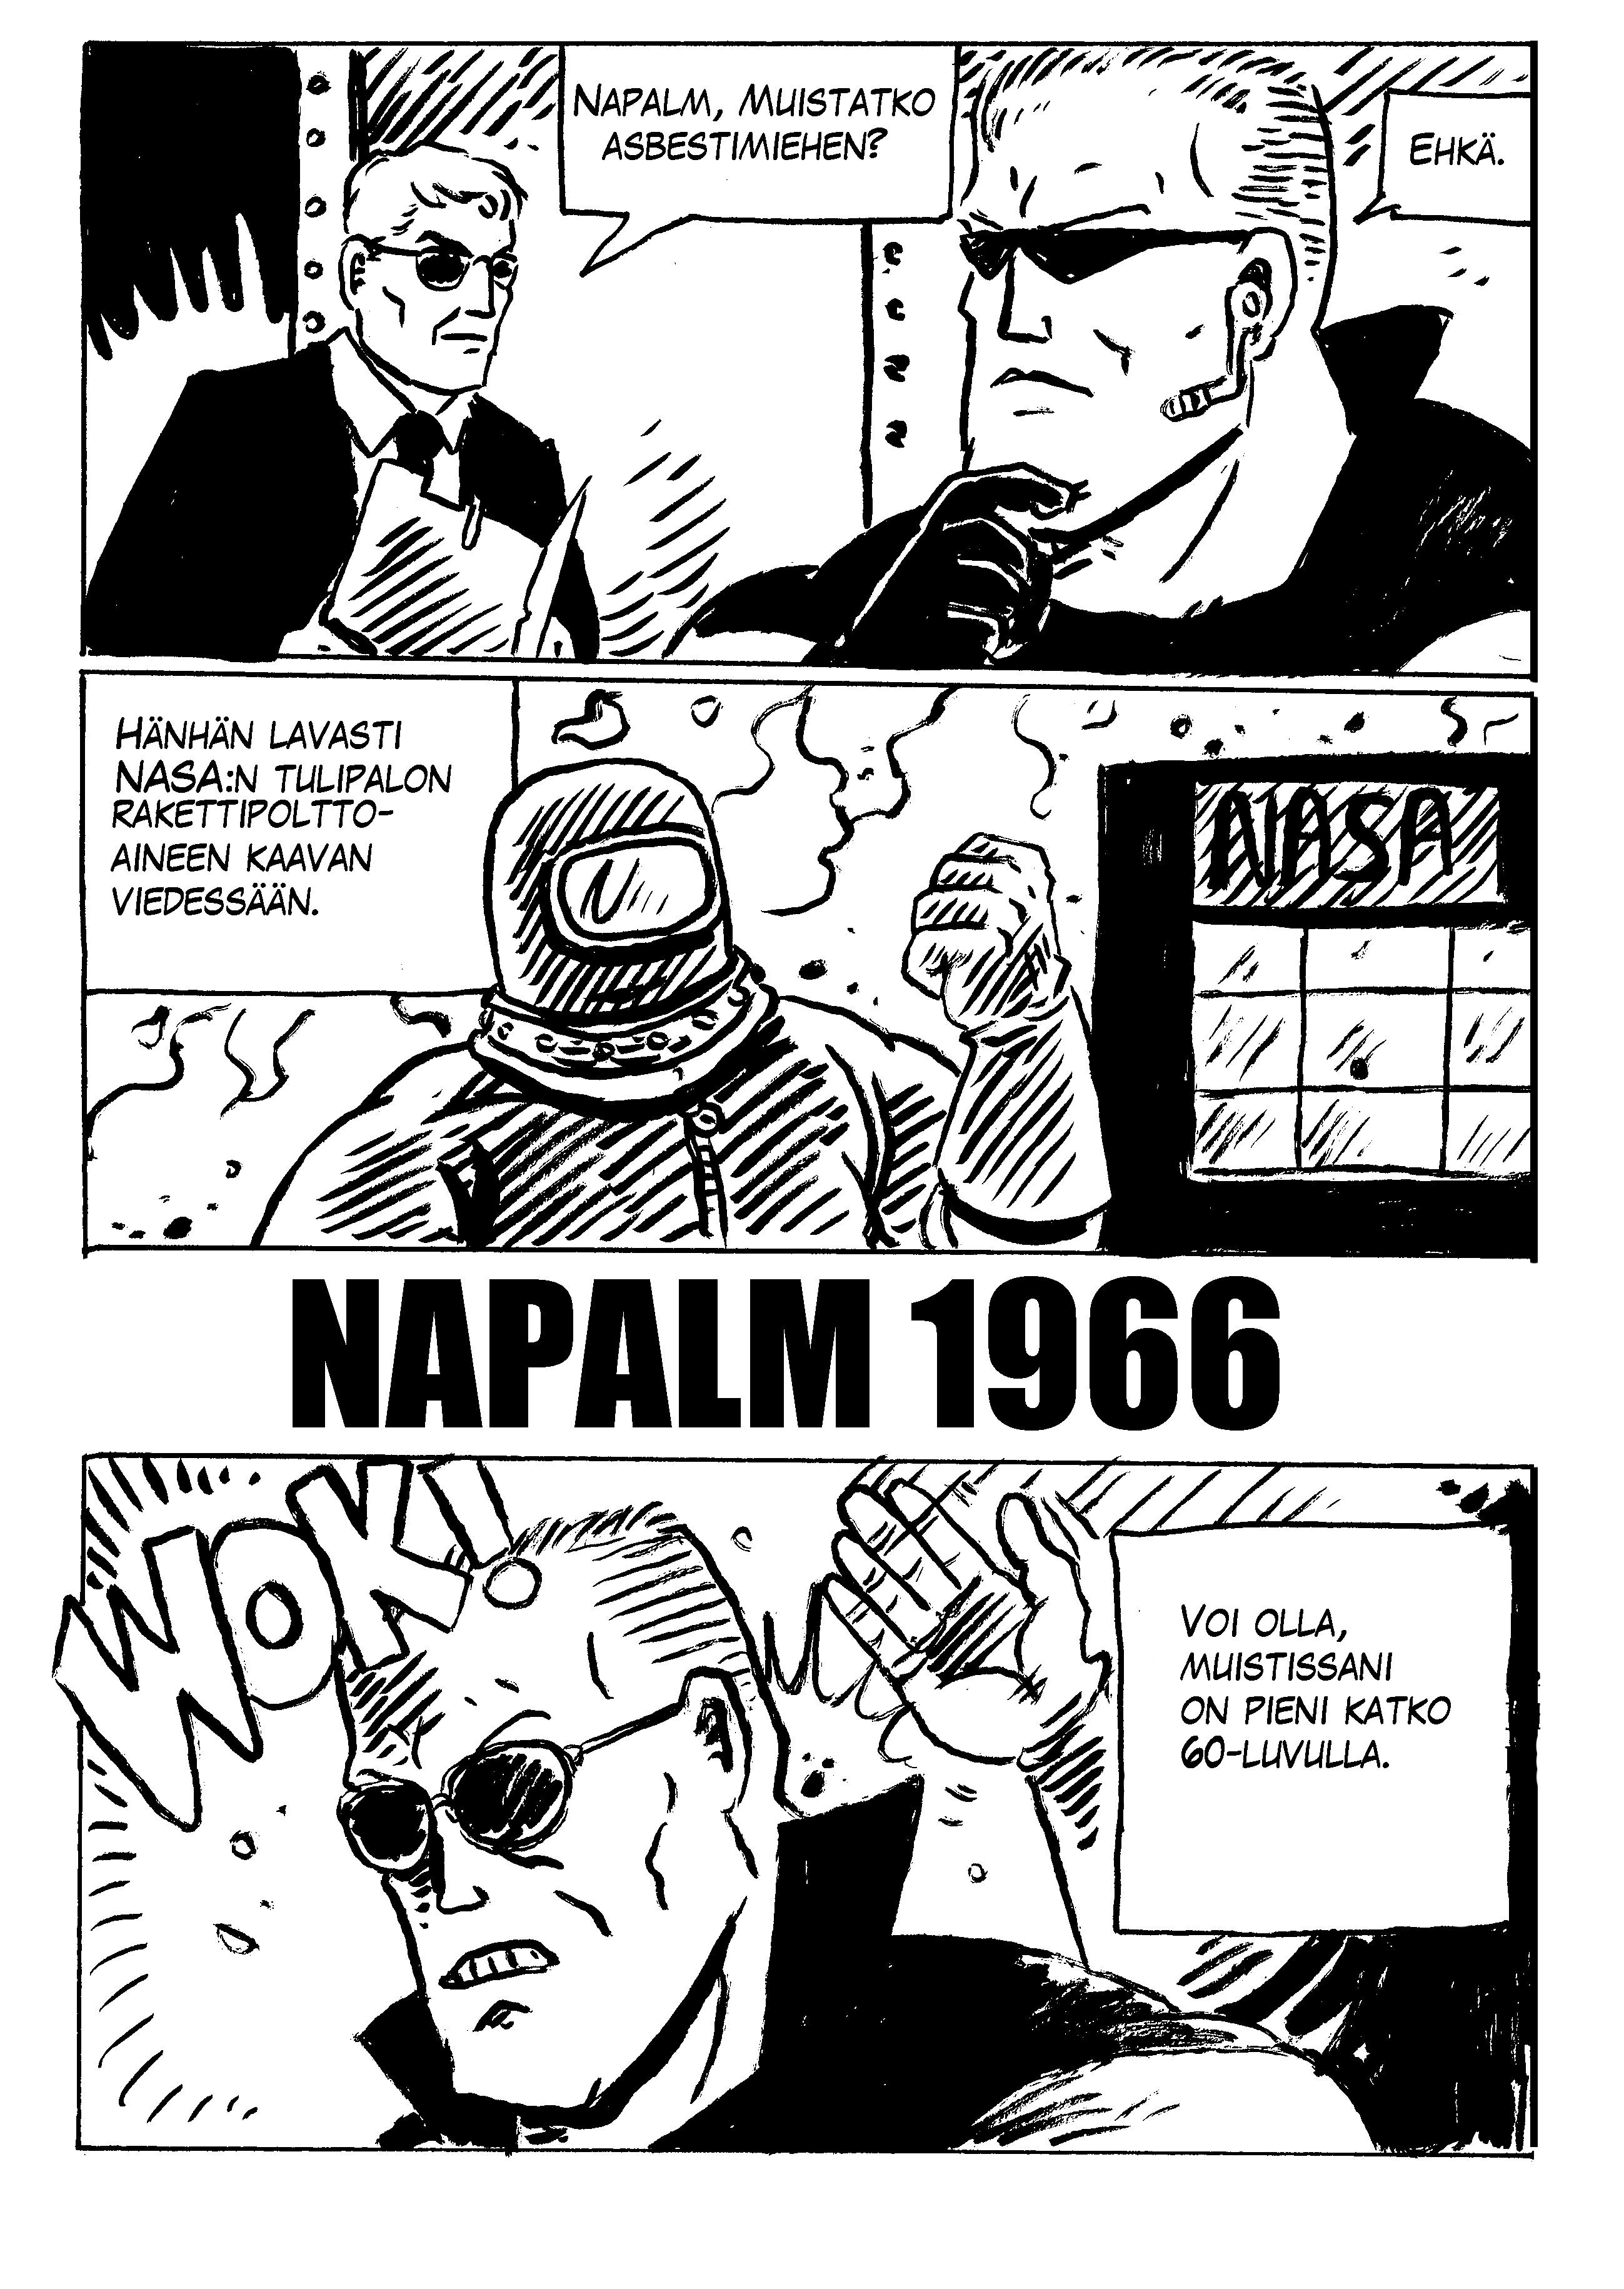 napalm1